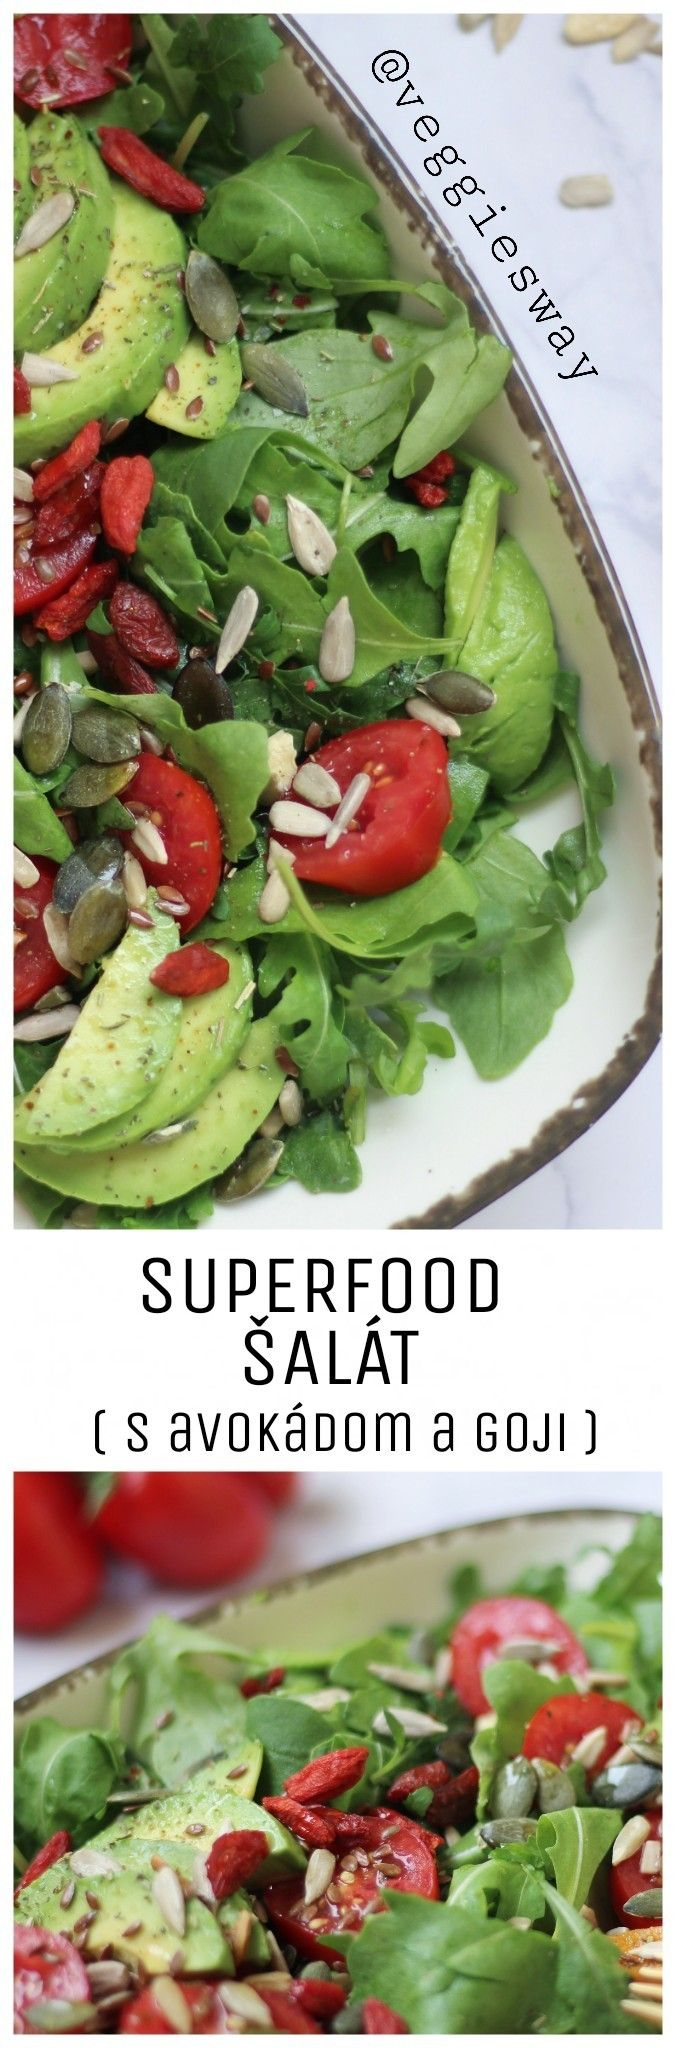 Superfood šalát